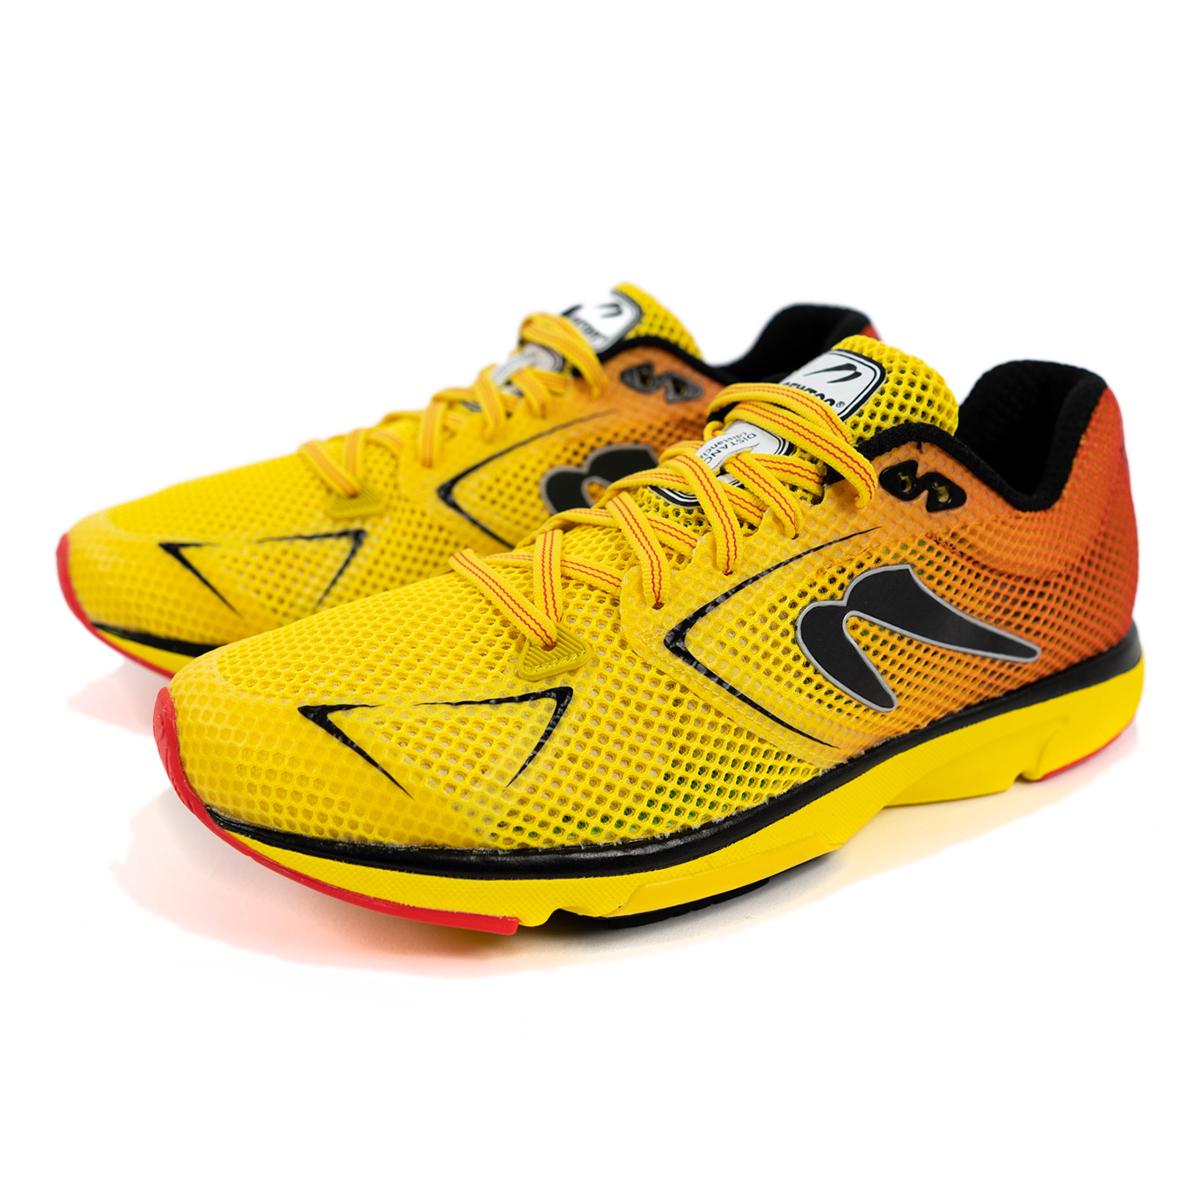 Men's Newton Distance 9 Running Shoe - Color: Sunfire/Black (Regular Width) - Size: 6, Sunfire/Black, large, image 3